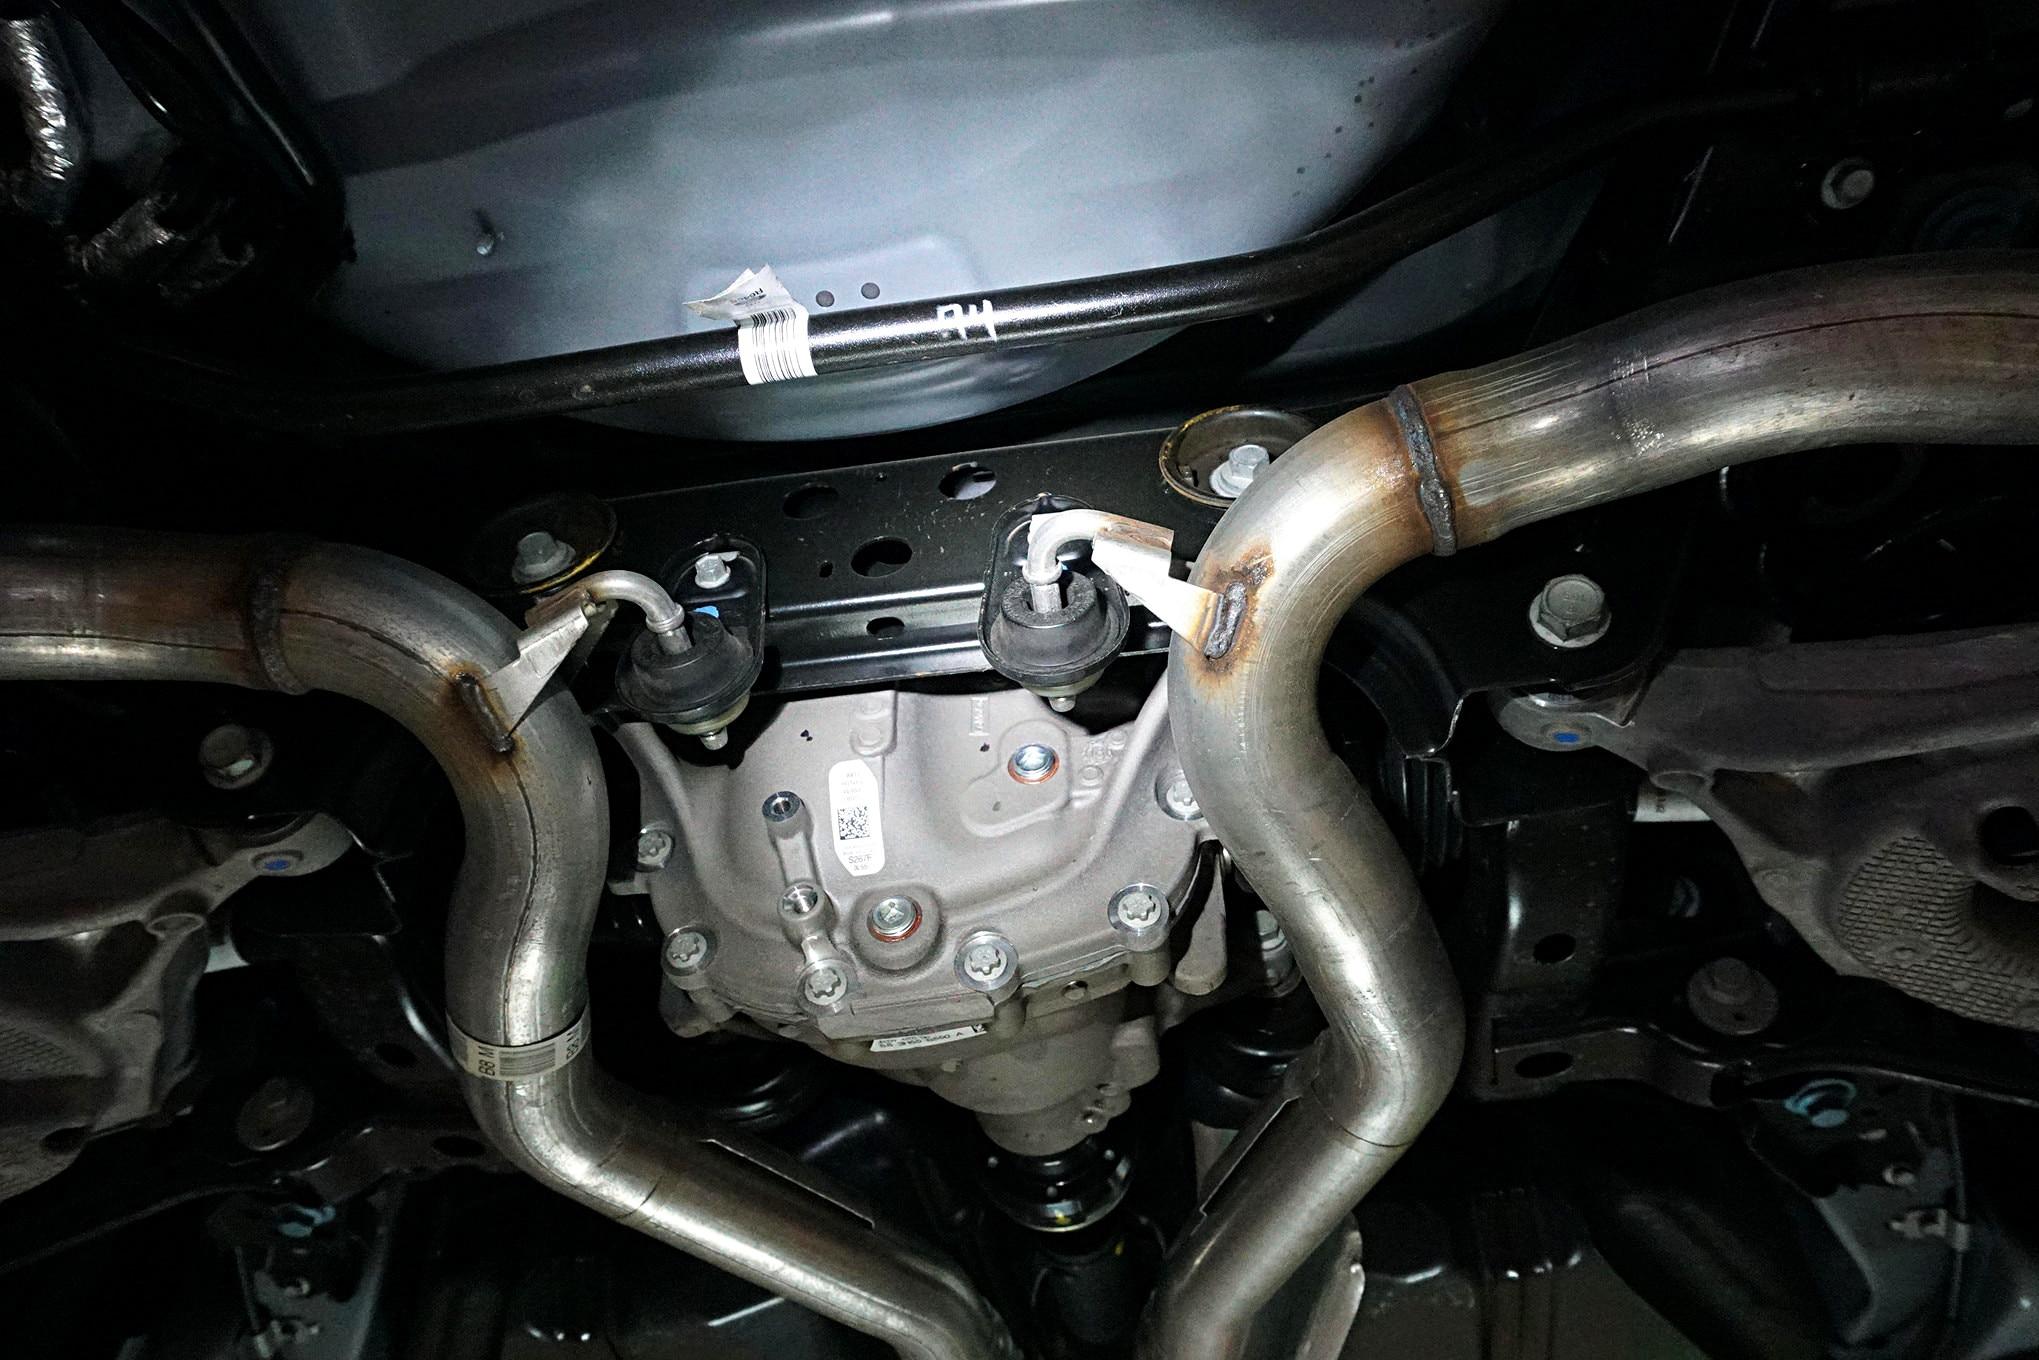 014 Mustang Kooks Exhaust